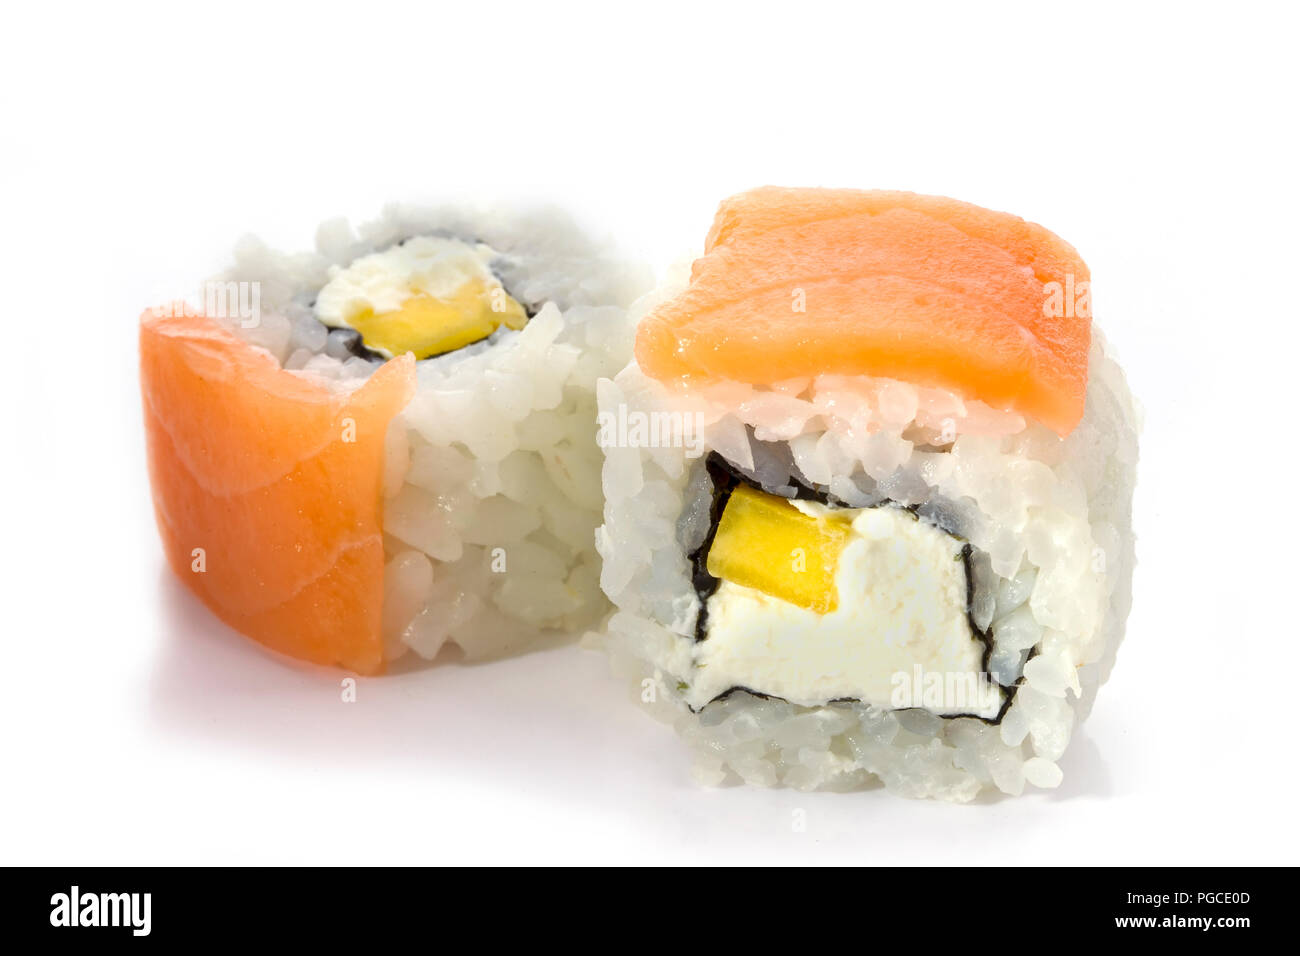 Sushi Rolls Japanese Food Isolated On White Background Menu Of The